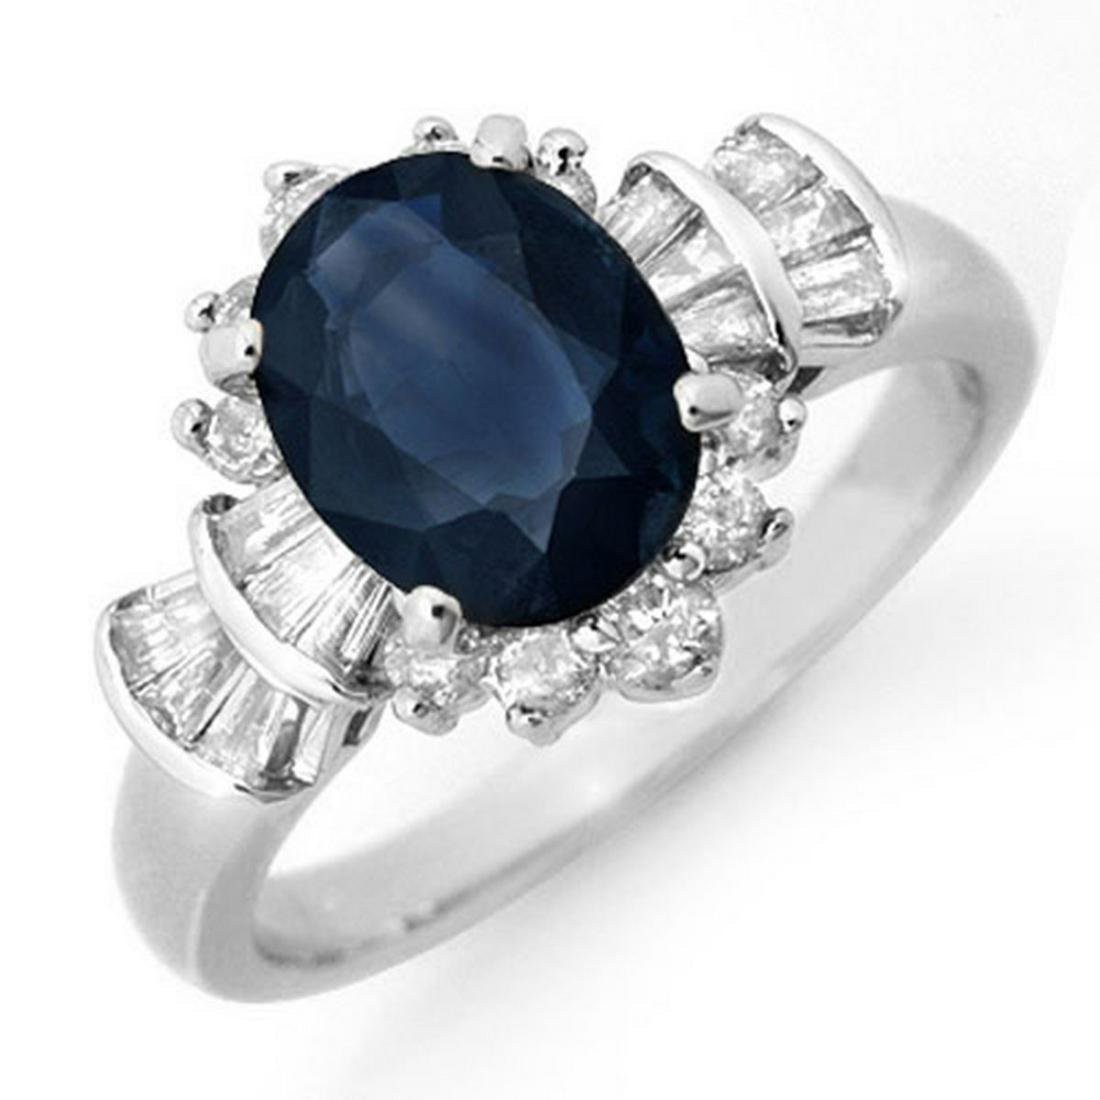 2.13 ctw Blue Sapphire & Diamond Ring 18K White Gold